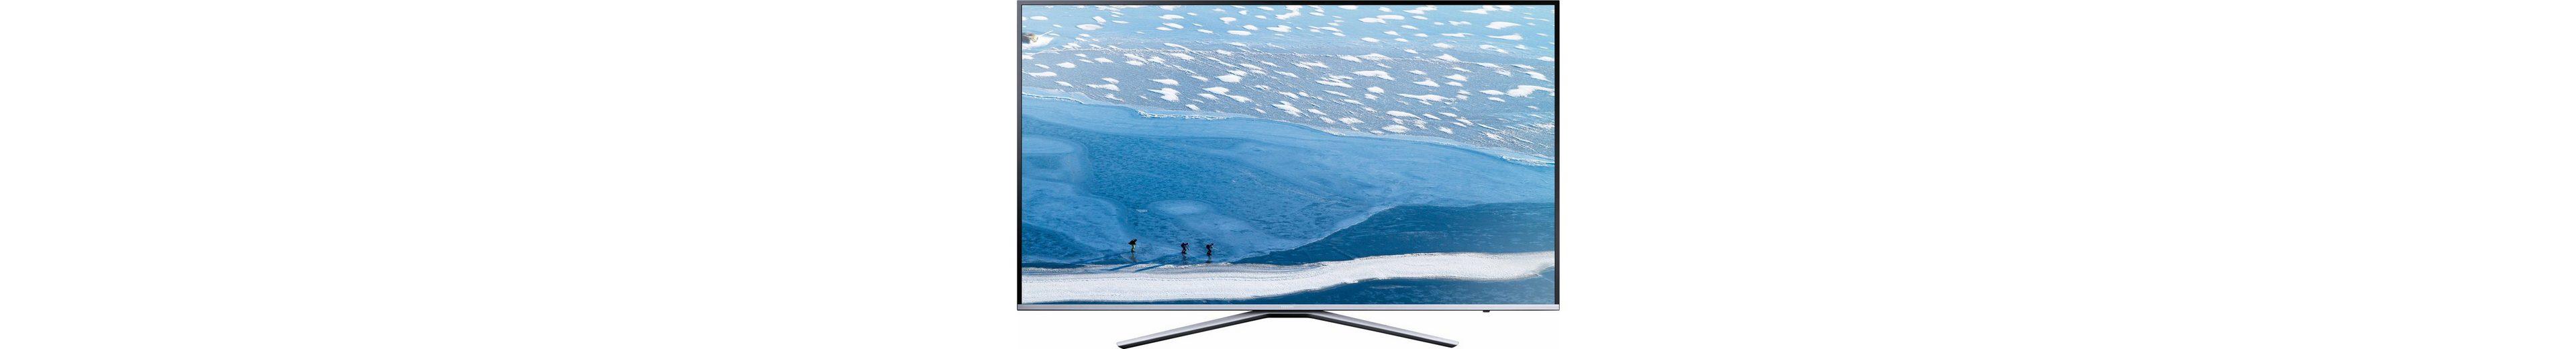 Samsung UE49KU6409UXZG, LED Fernseher, 123 cm (49 Zoll), 2160p (4K Ultra HD), Smart-TV